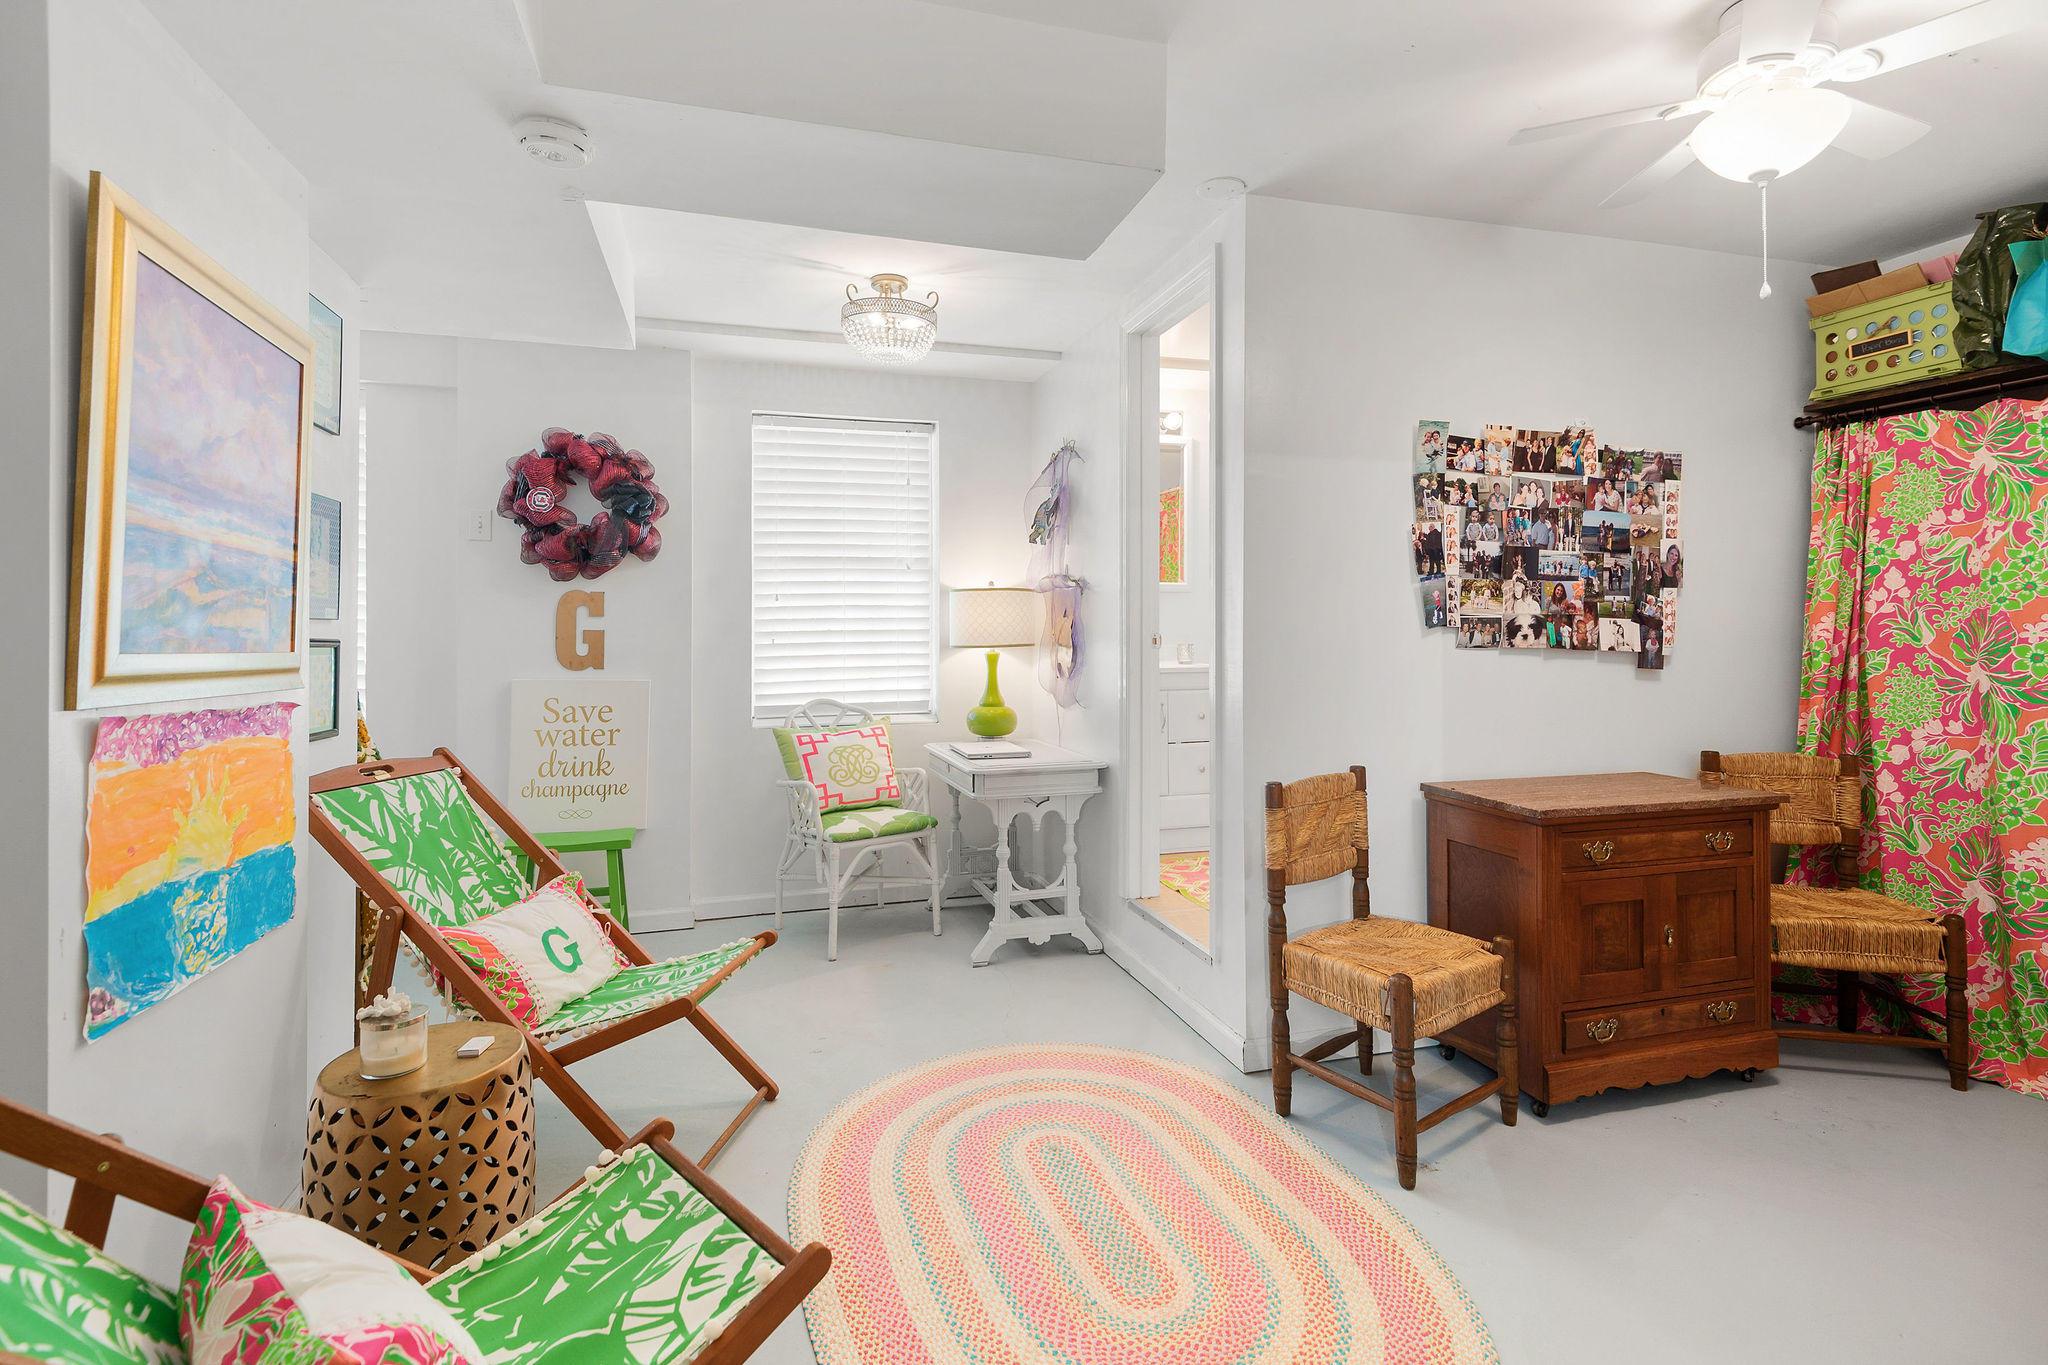 Country Club II Homes For Sale - 1482 Burningtree, Charleston, SC - 17